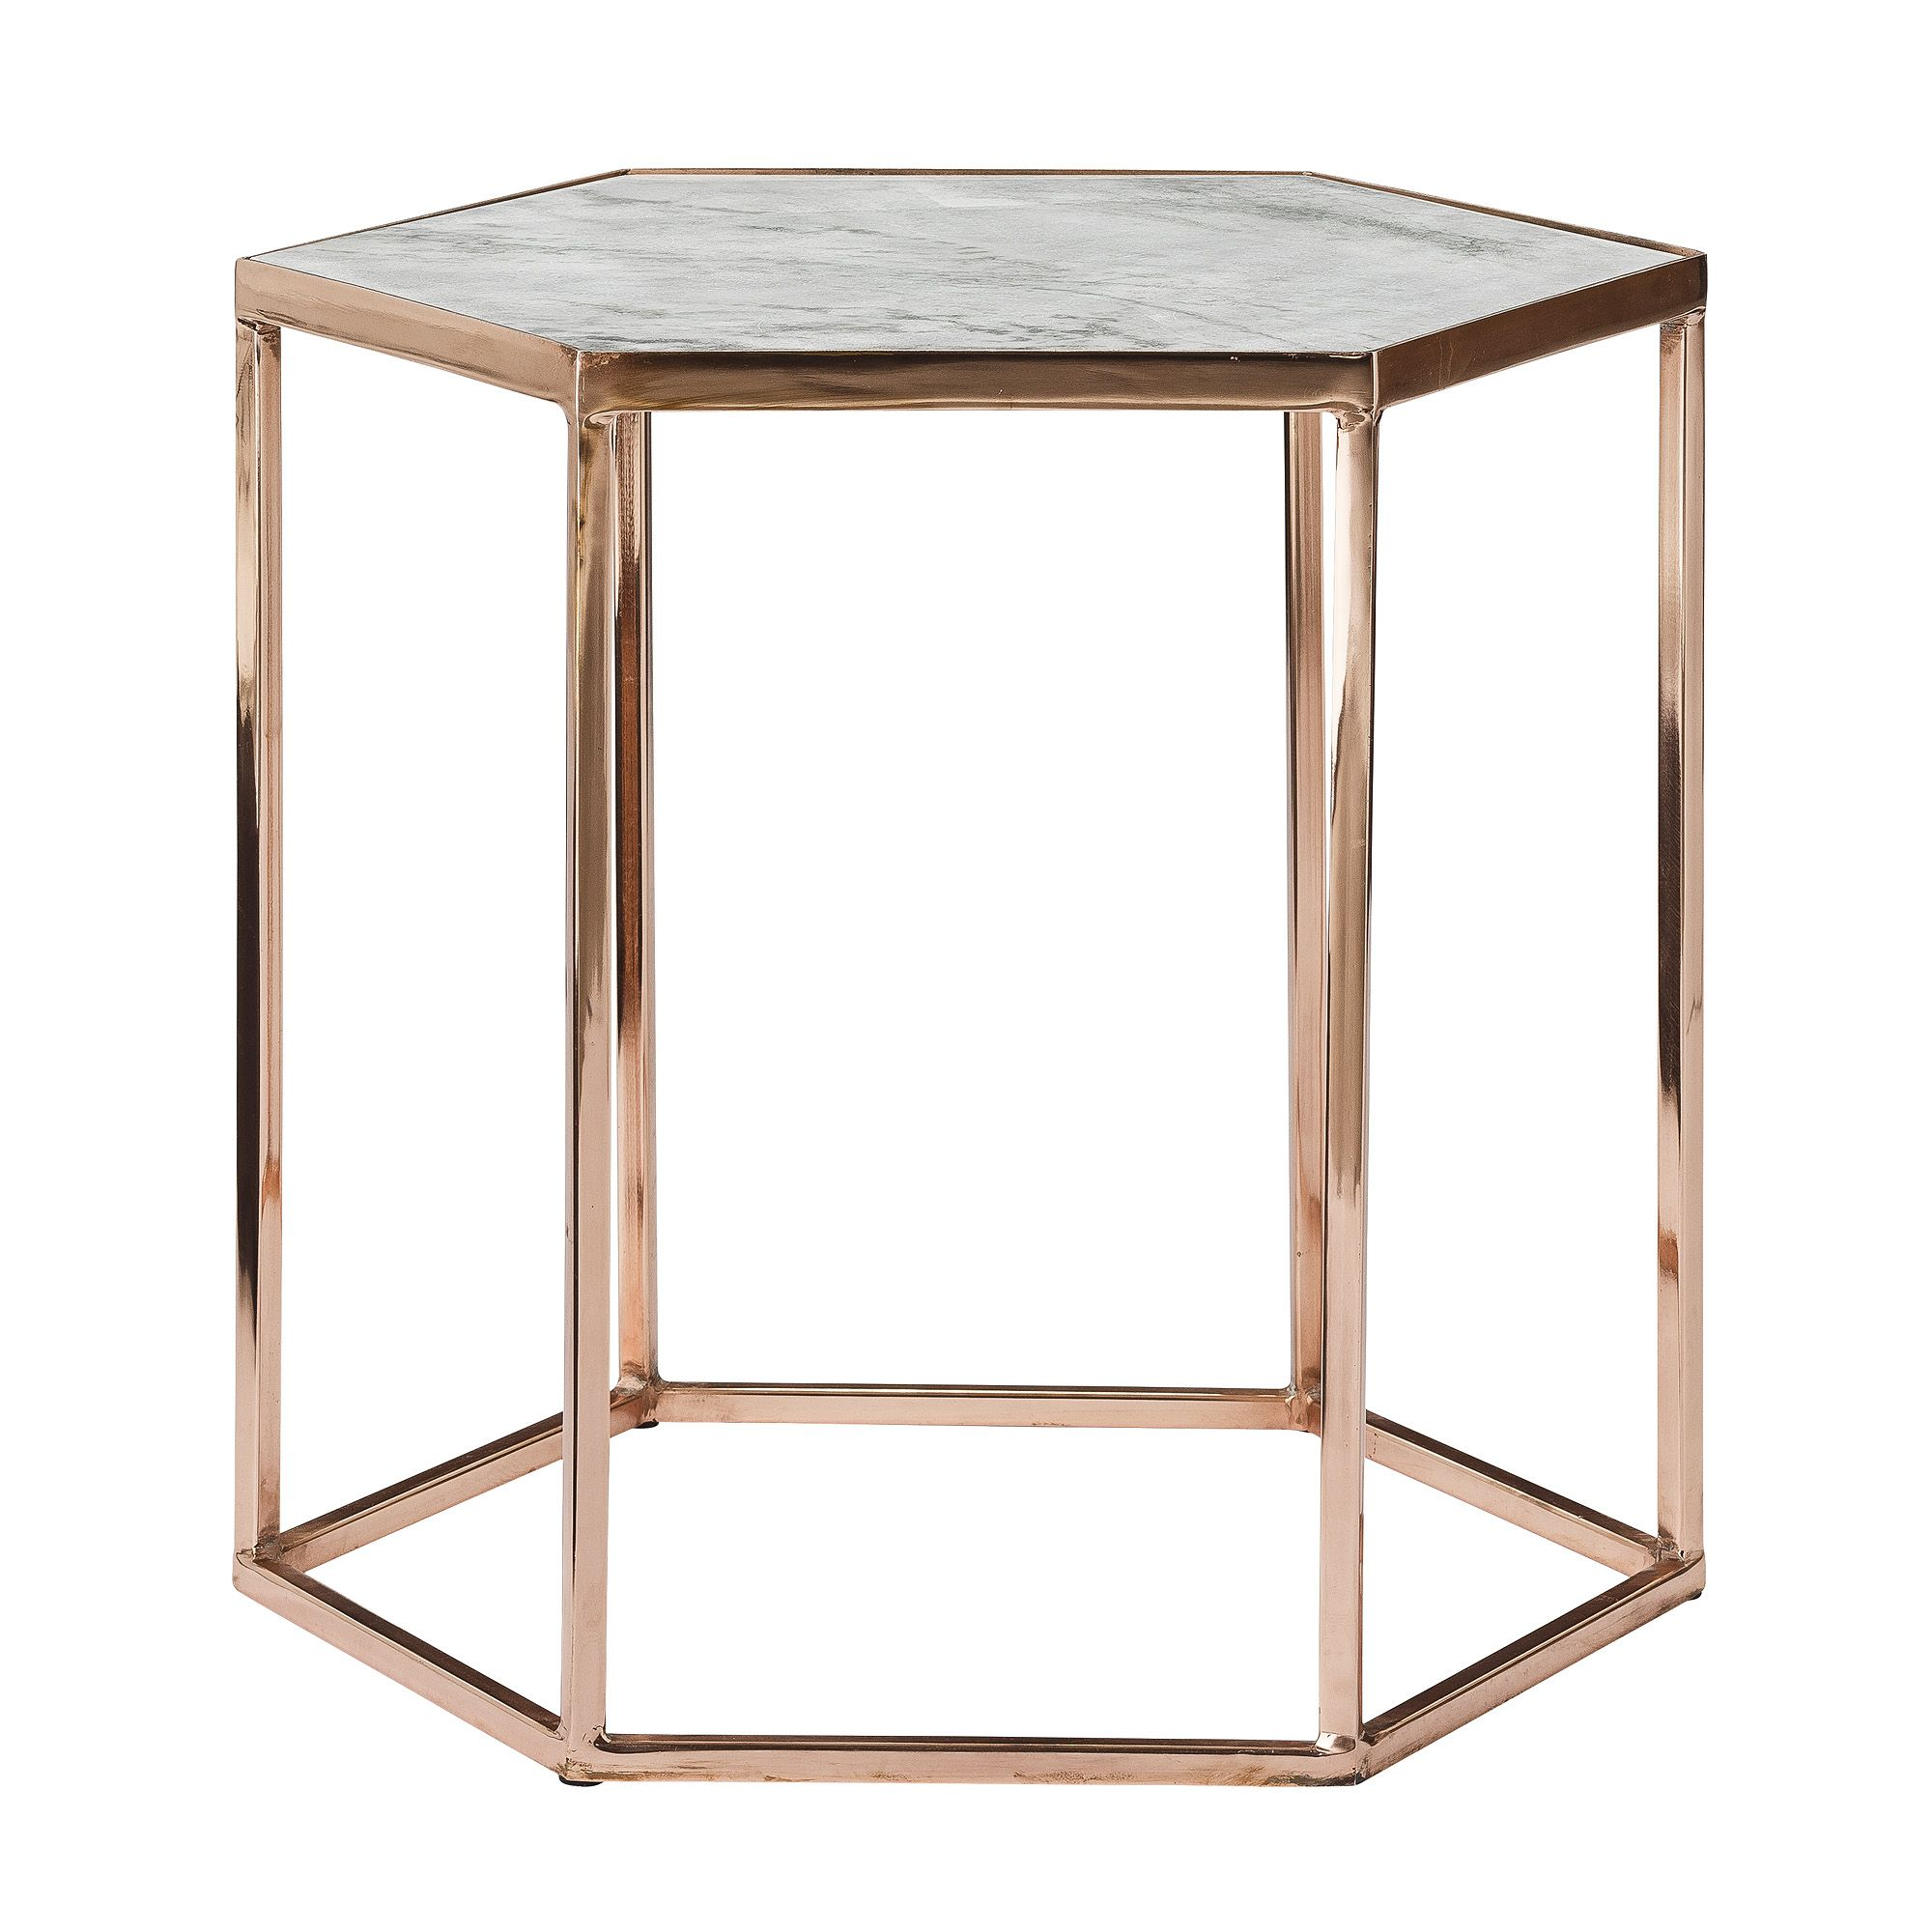 Stolik Miedz Marmur Copper Side Table Marble Top Coffee Table